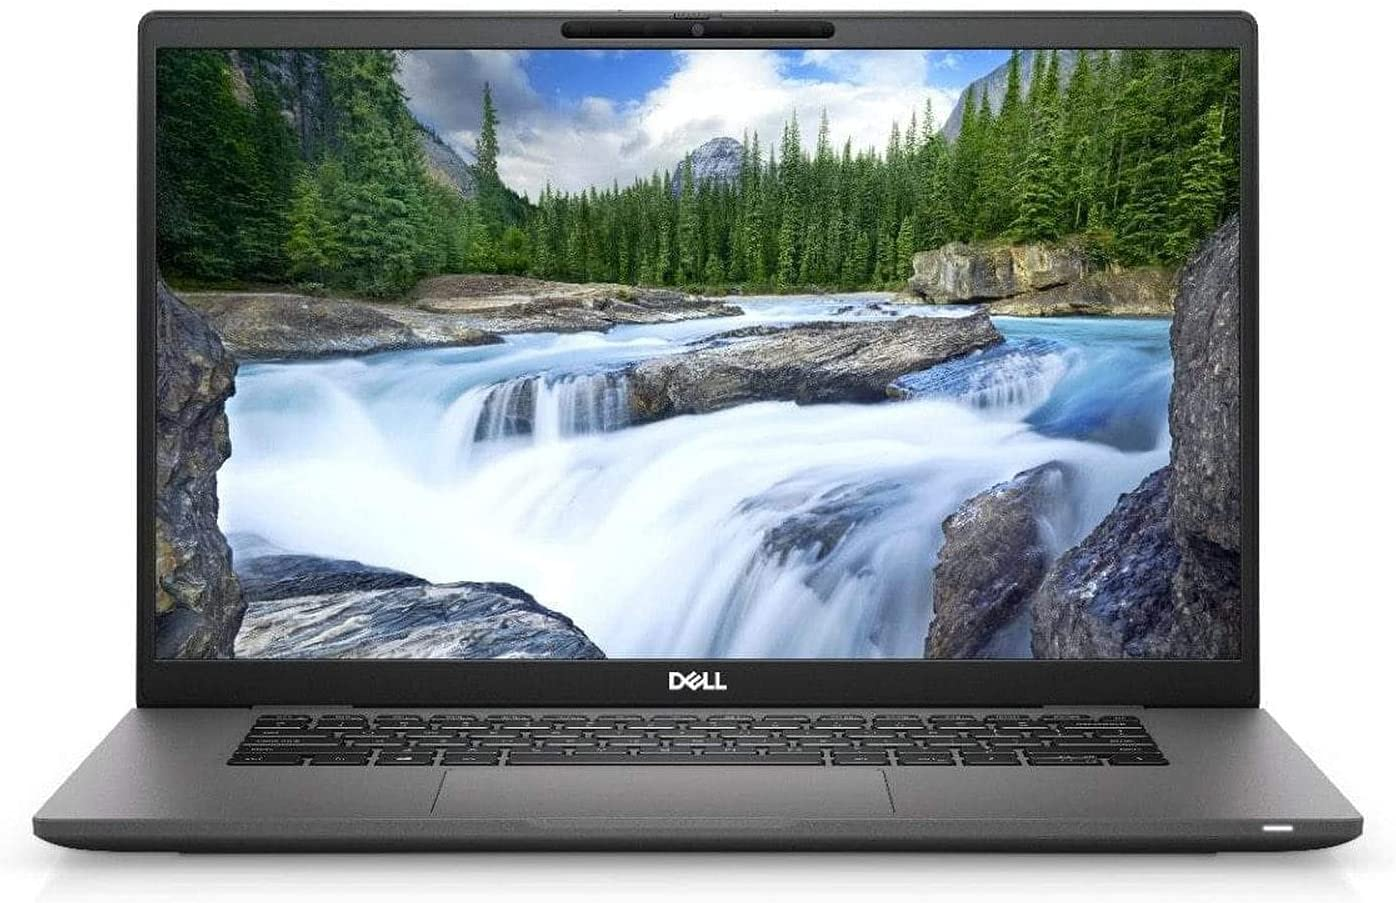 Dell Latitude 7520 Laptop 15.6 - Intel Core i7 11th Gen - i7-1185G7 - Quad Core 4.4Ghz - 256GB SSD - 16GB RAM - 1920x1080 FHD - Windows 10 Pro